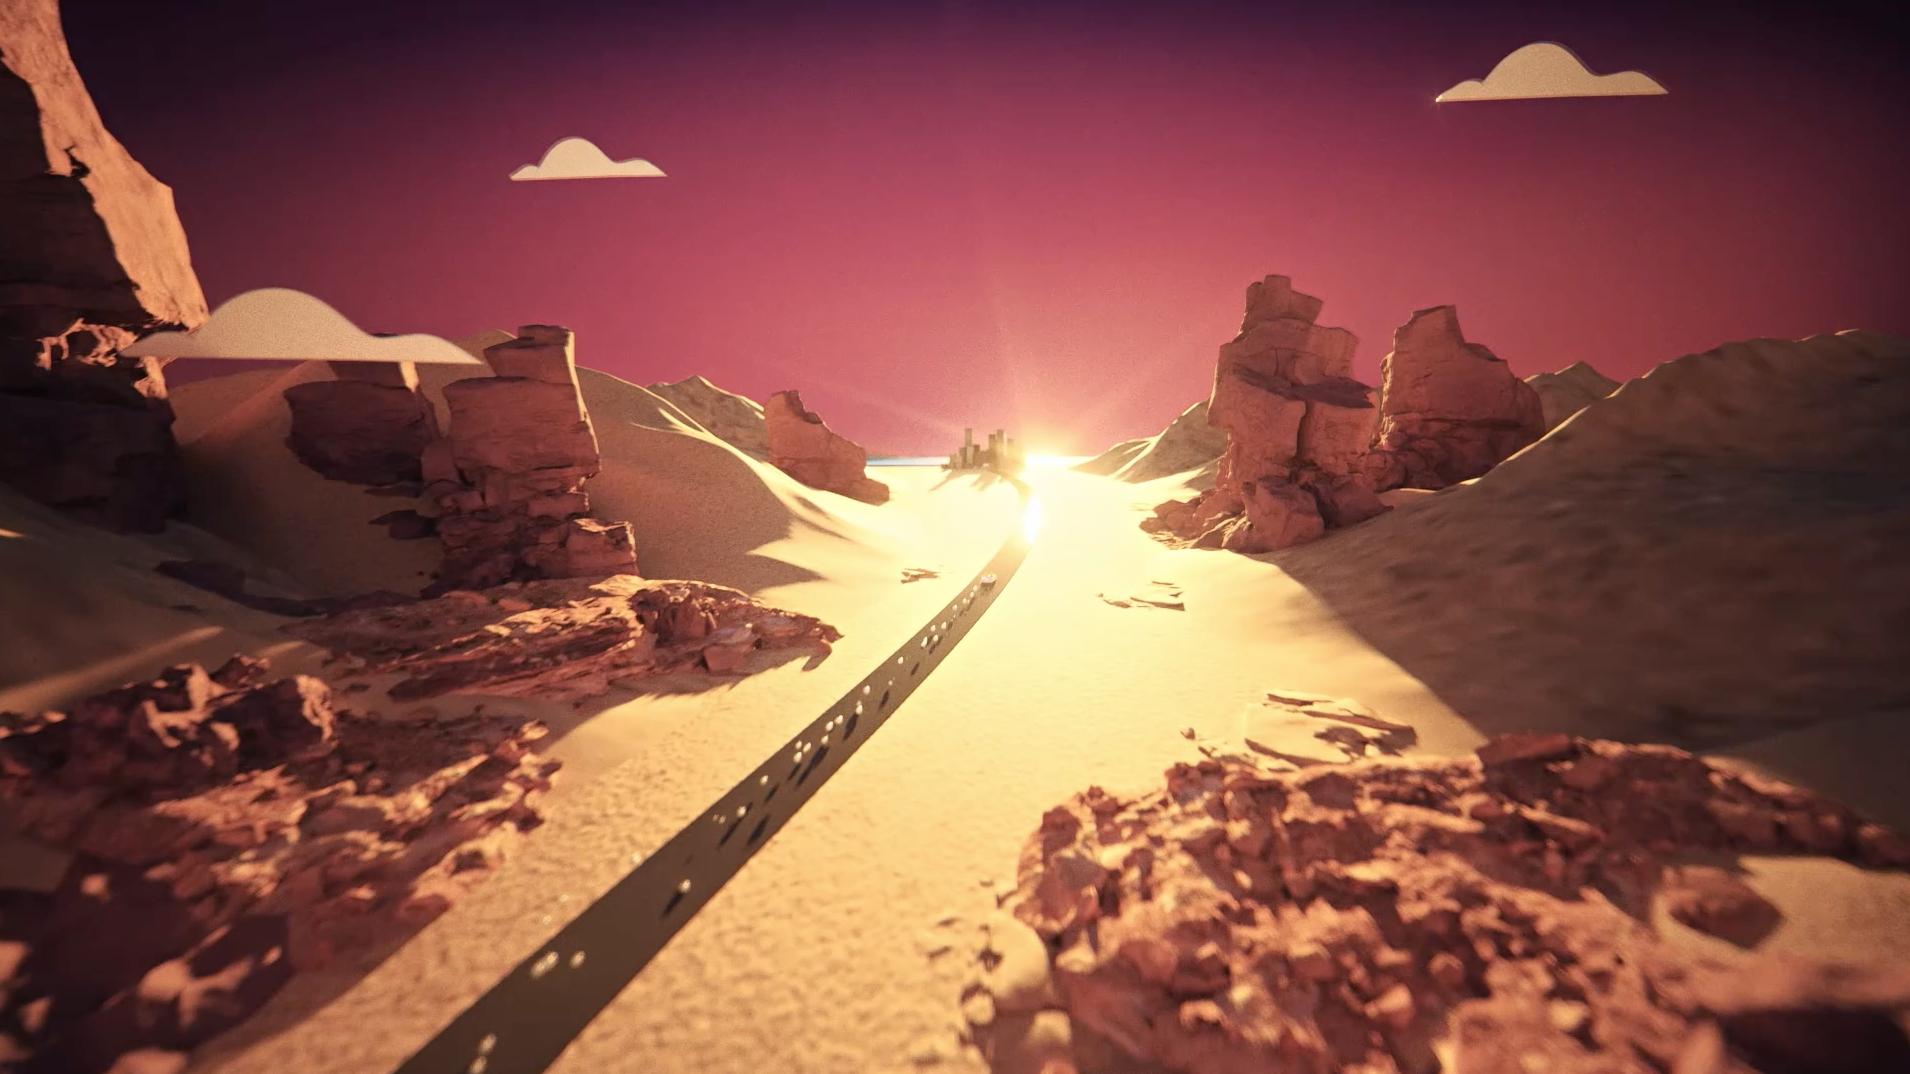 3d-motion-graphics-sunset